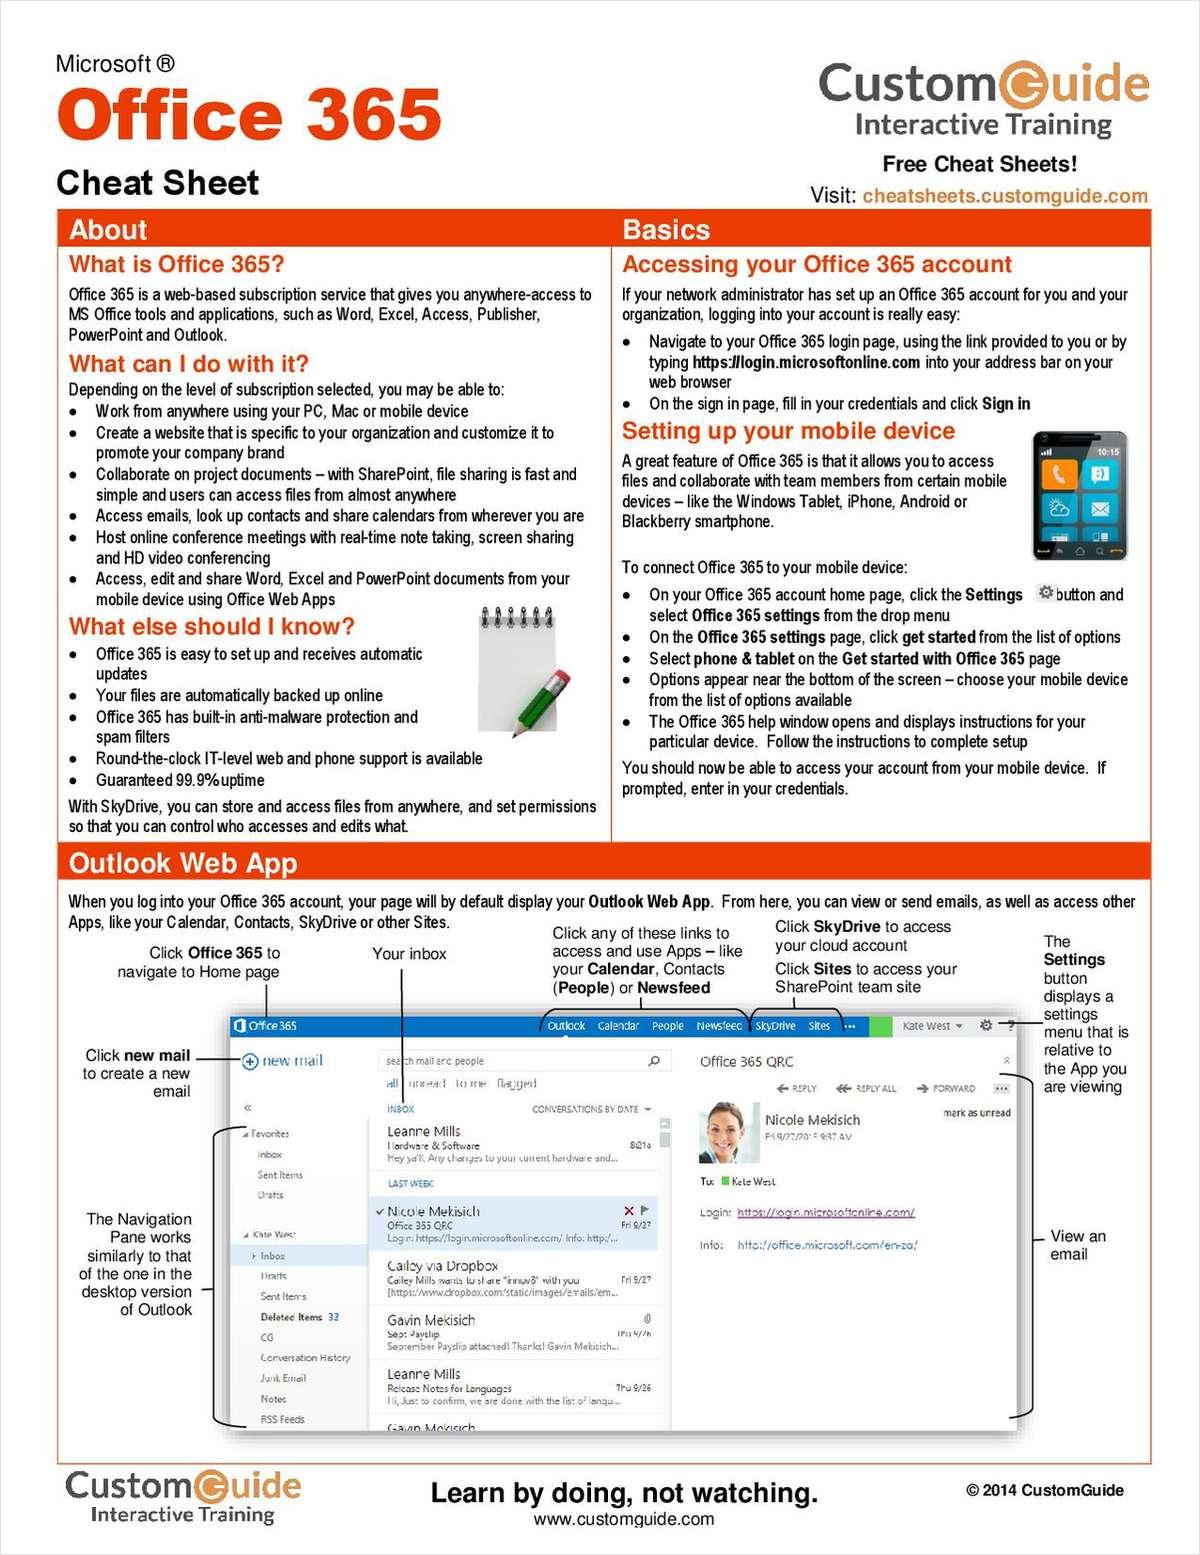 Microsoft Office 365 Free Cheat Sheet Free Customguide